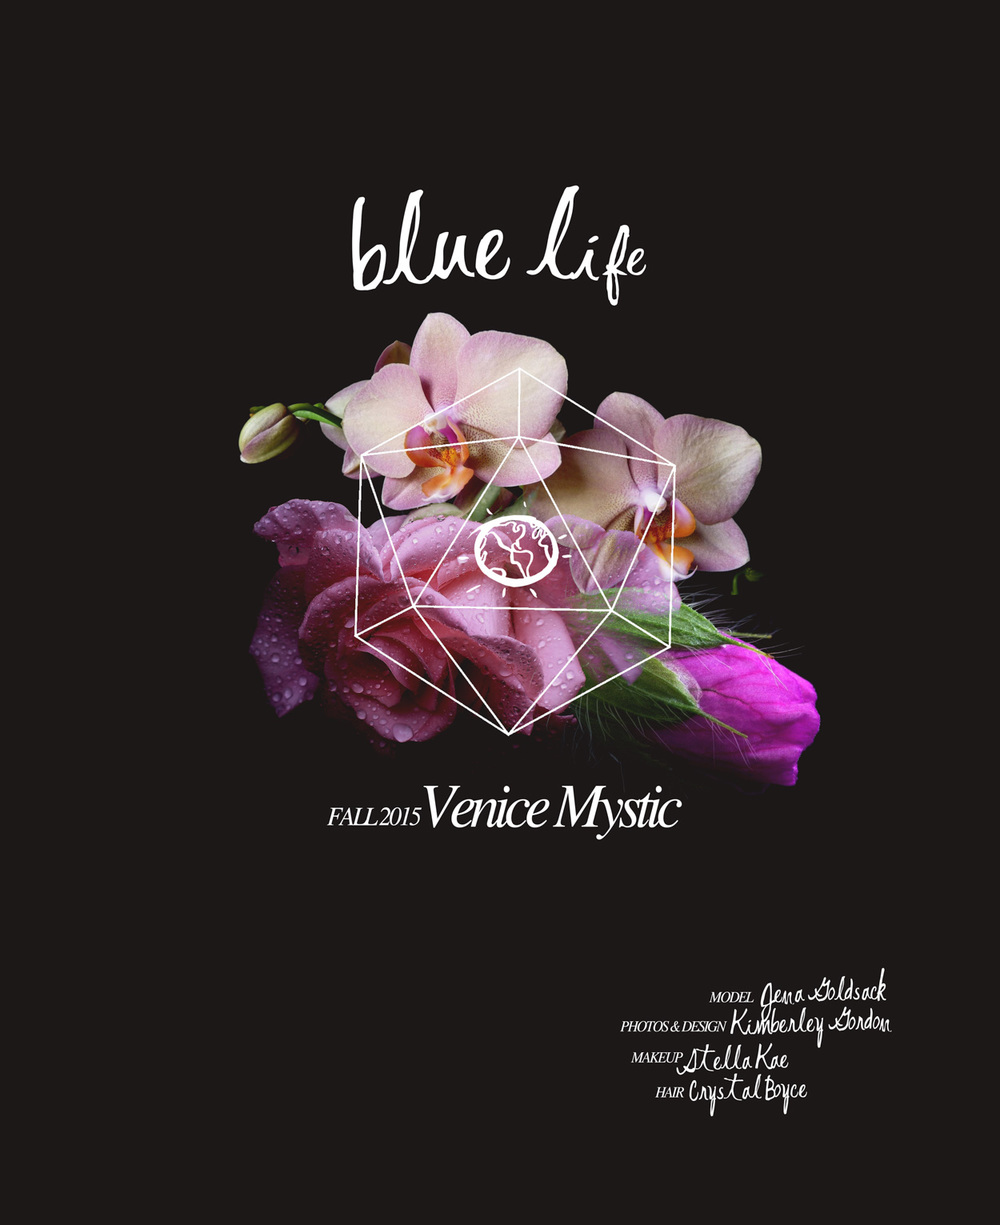 57c67-blue_life_mystic_sized282of4729.jpg